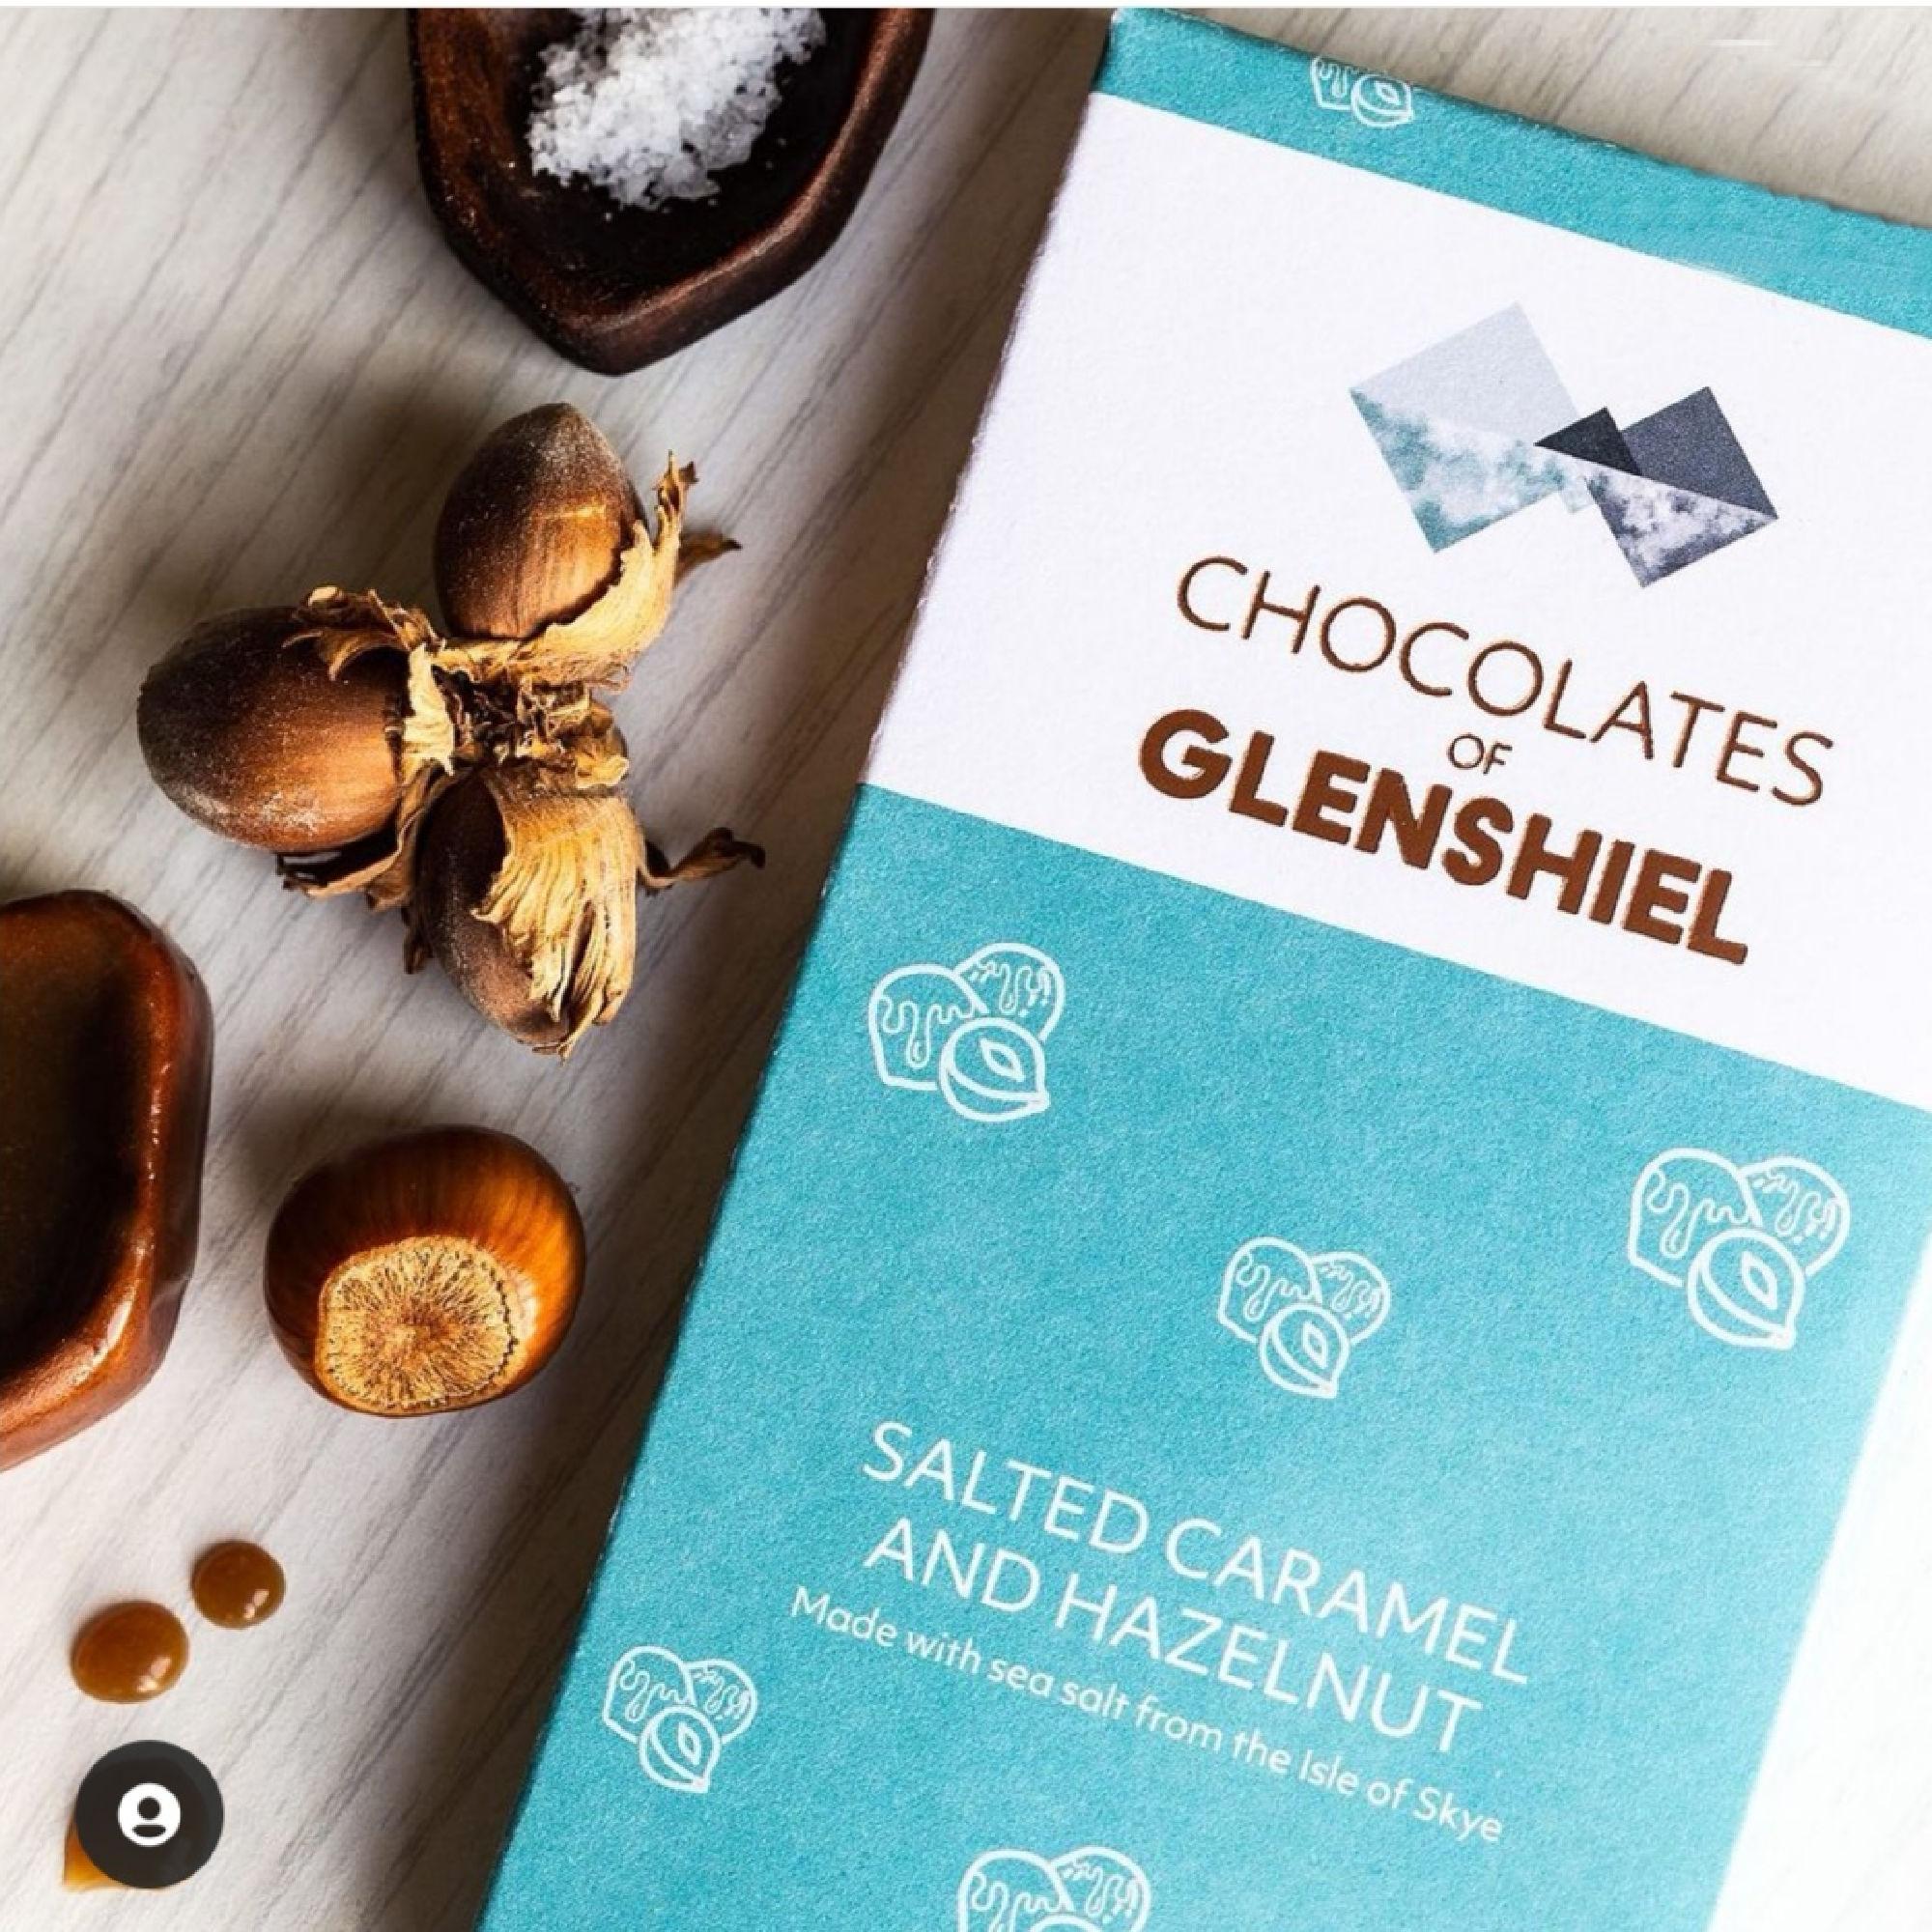 Chocolates of Glenshiel Chocolate Bars